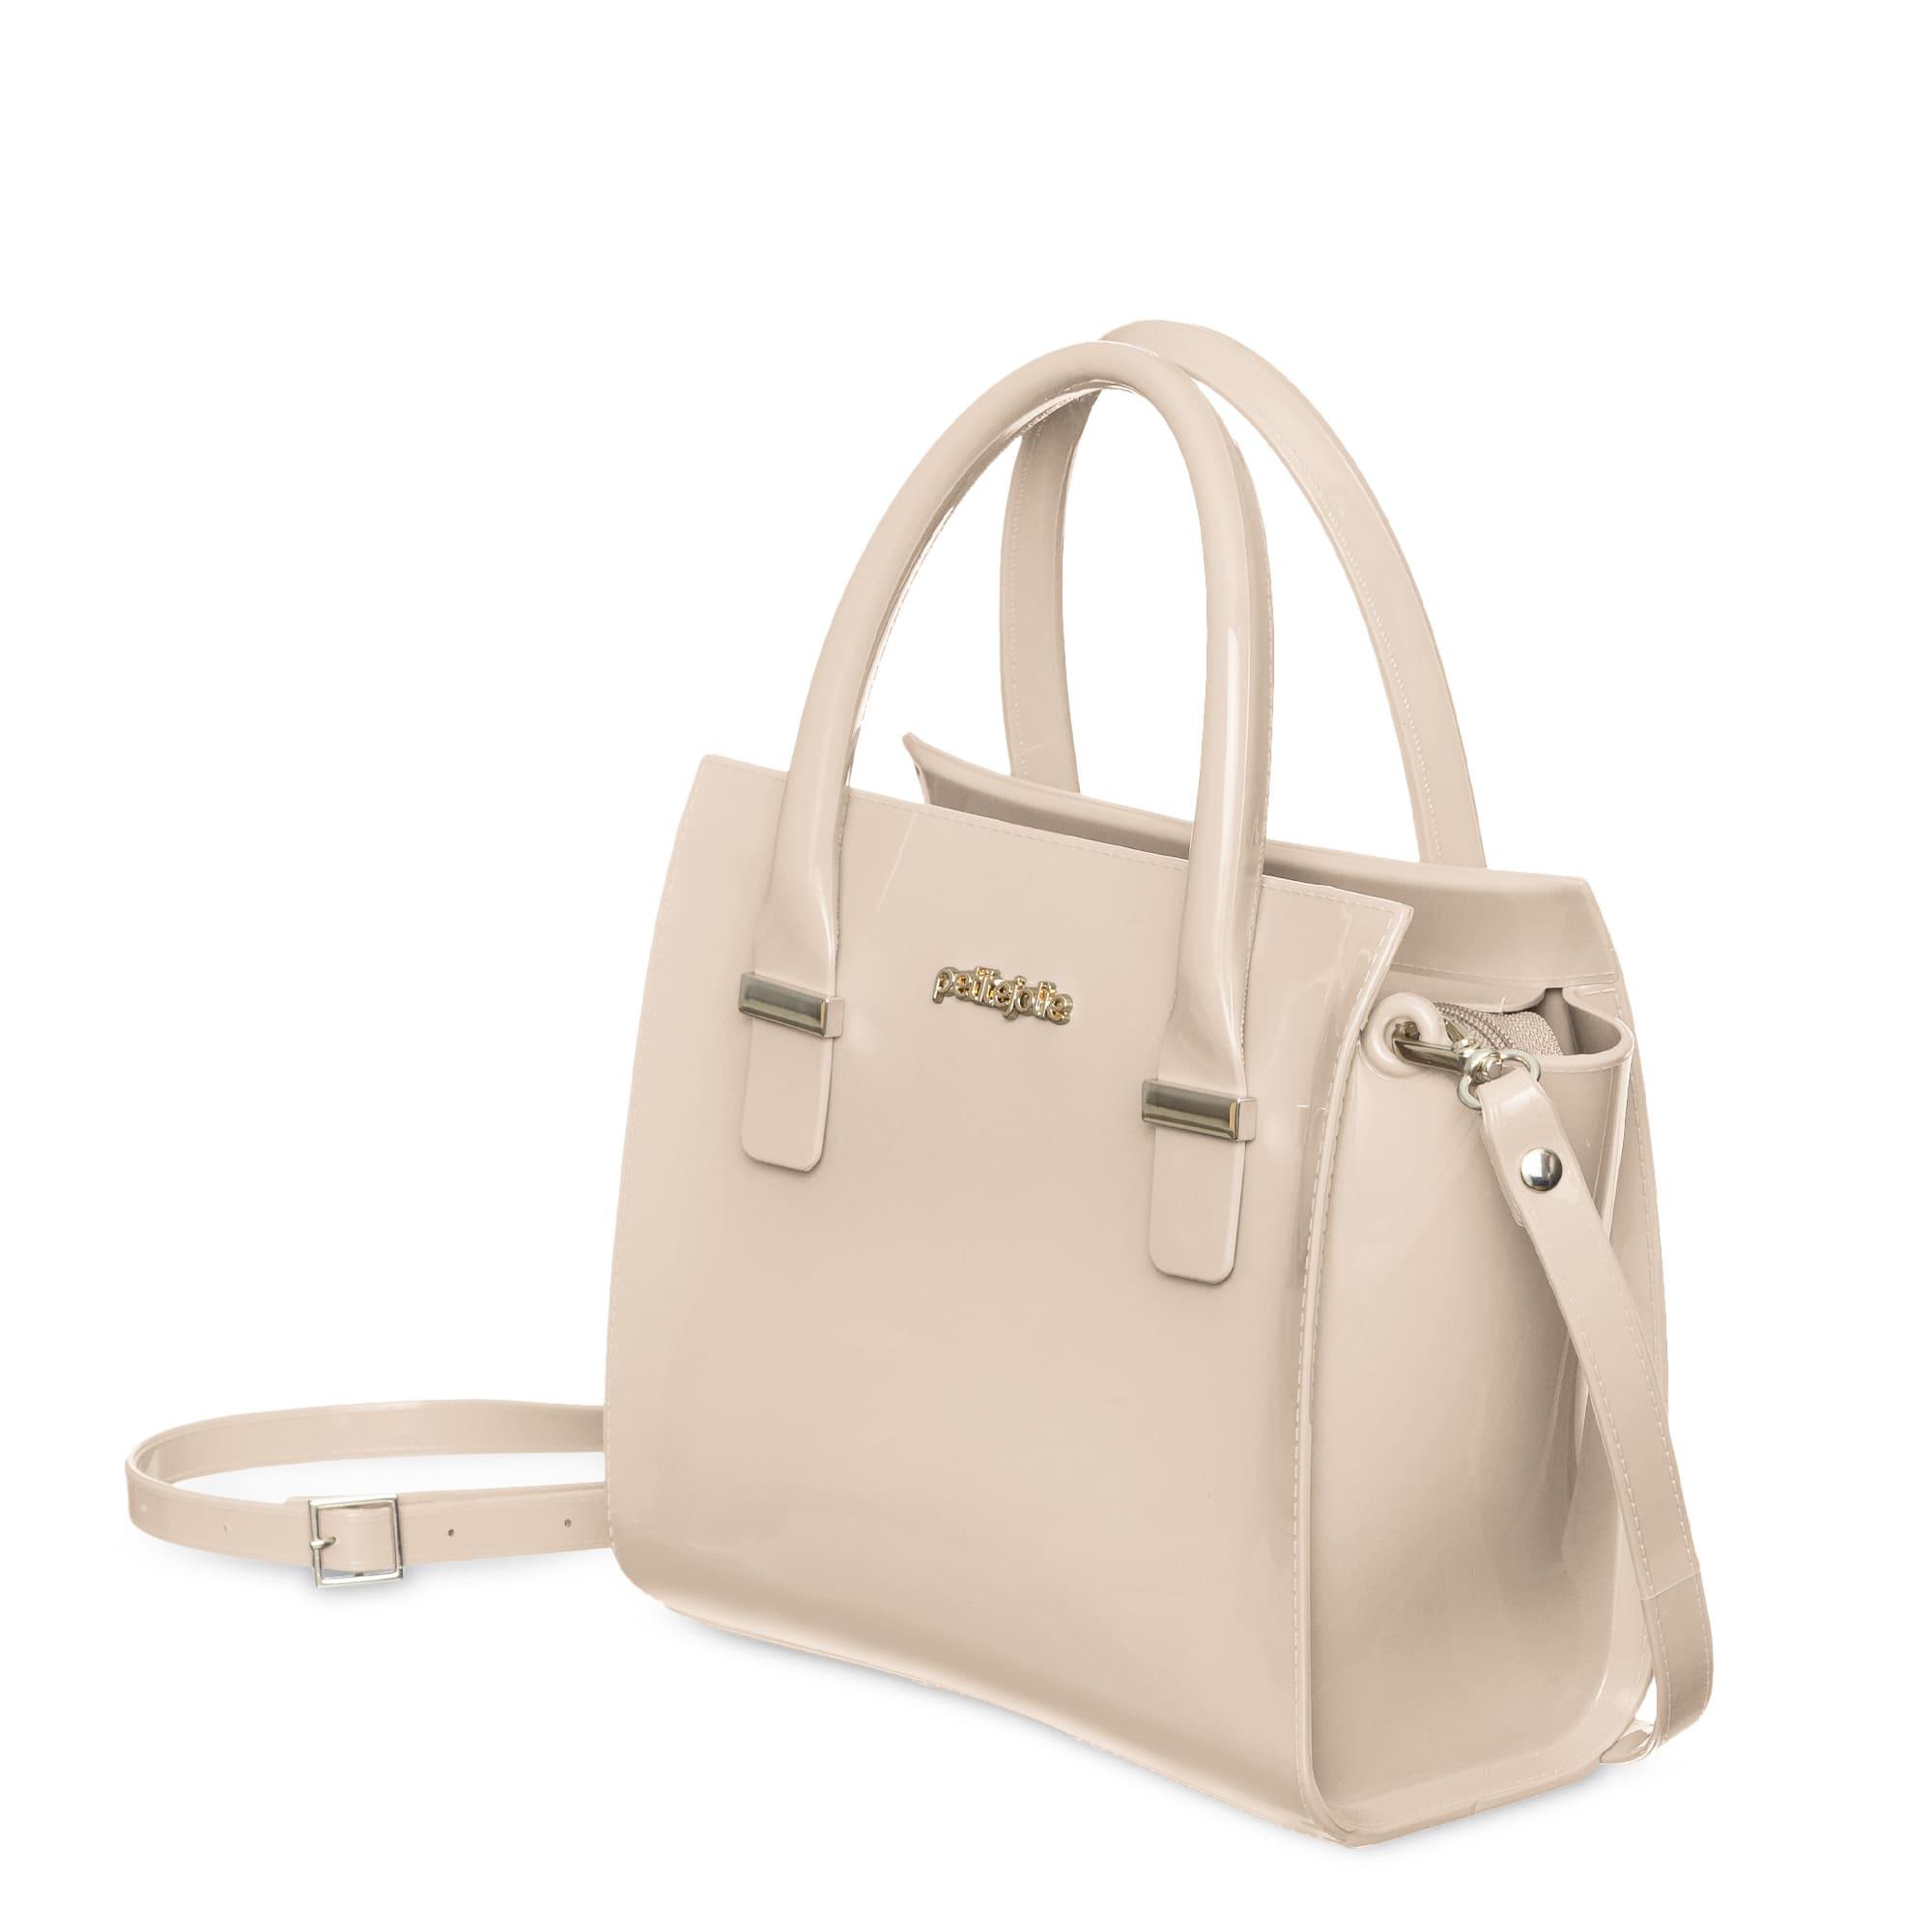 Bolsa Petite Jolie Love Bag PJ5214 Nude  - Prime Bolsas